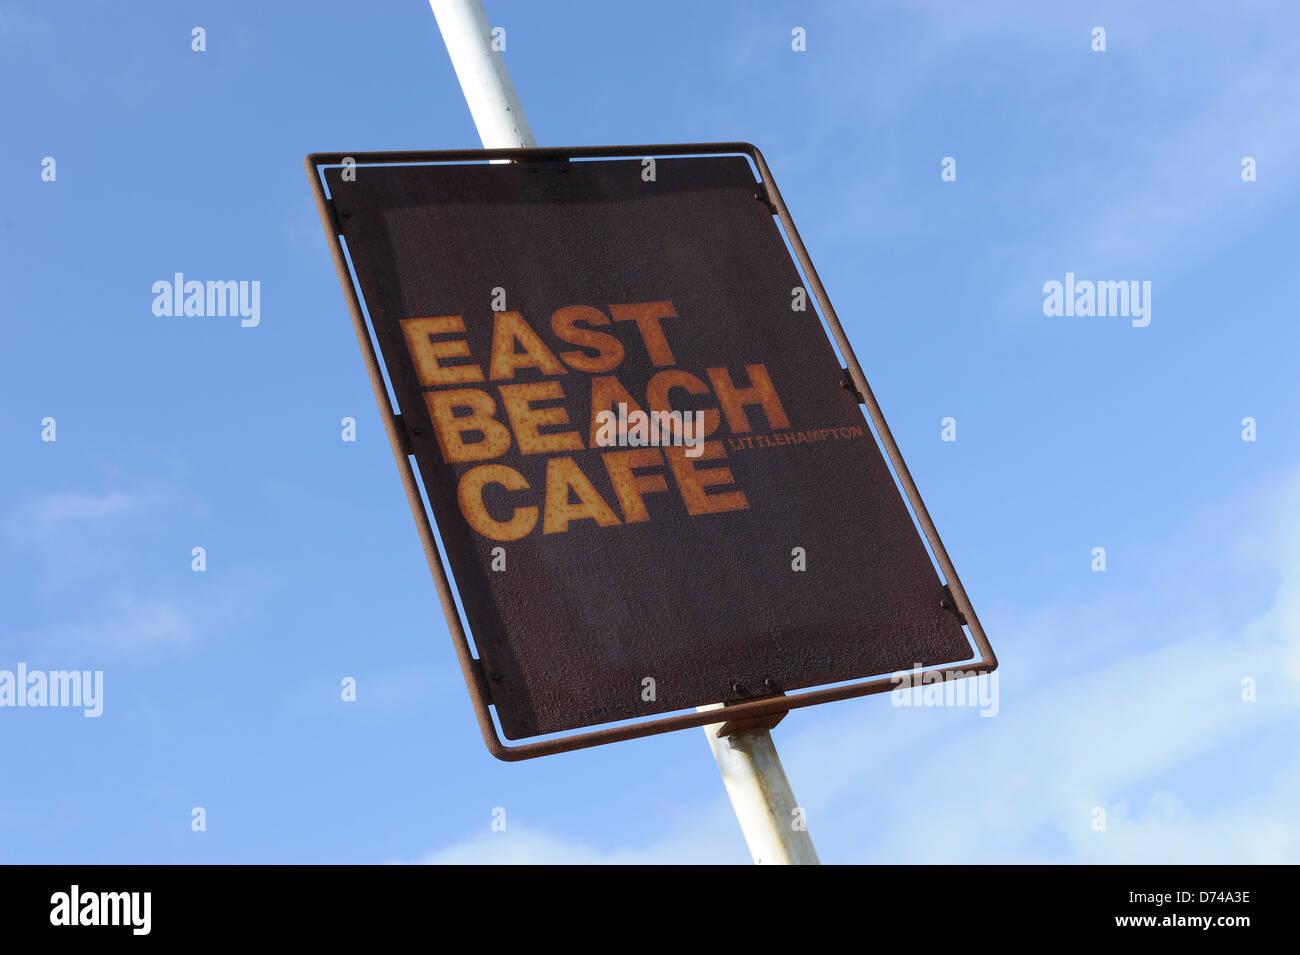 East Beach Cafe, Littlehampton, West Sussex by architect Thomas Heatherwick Stock Photo